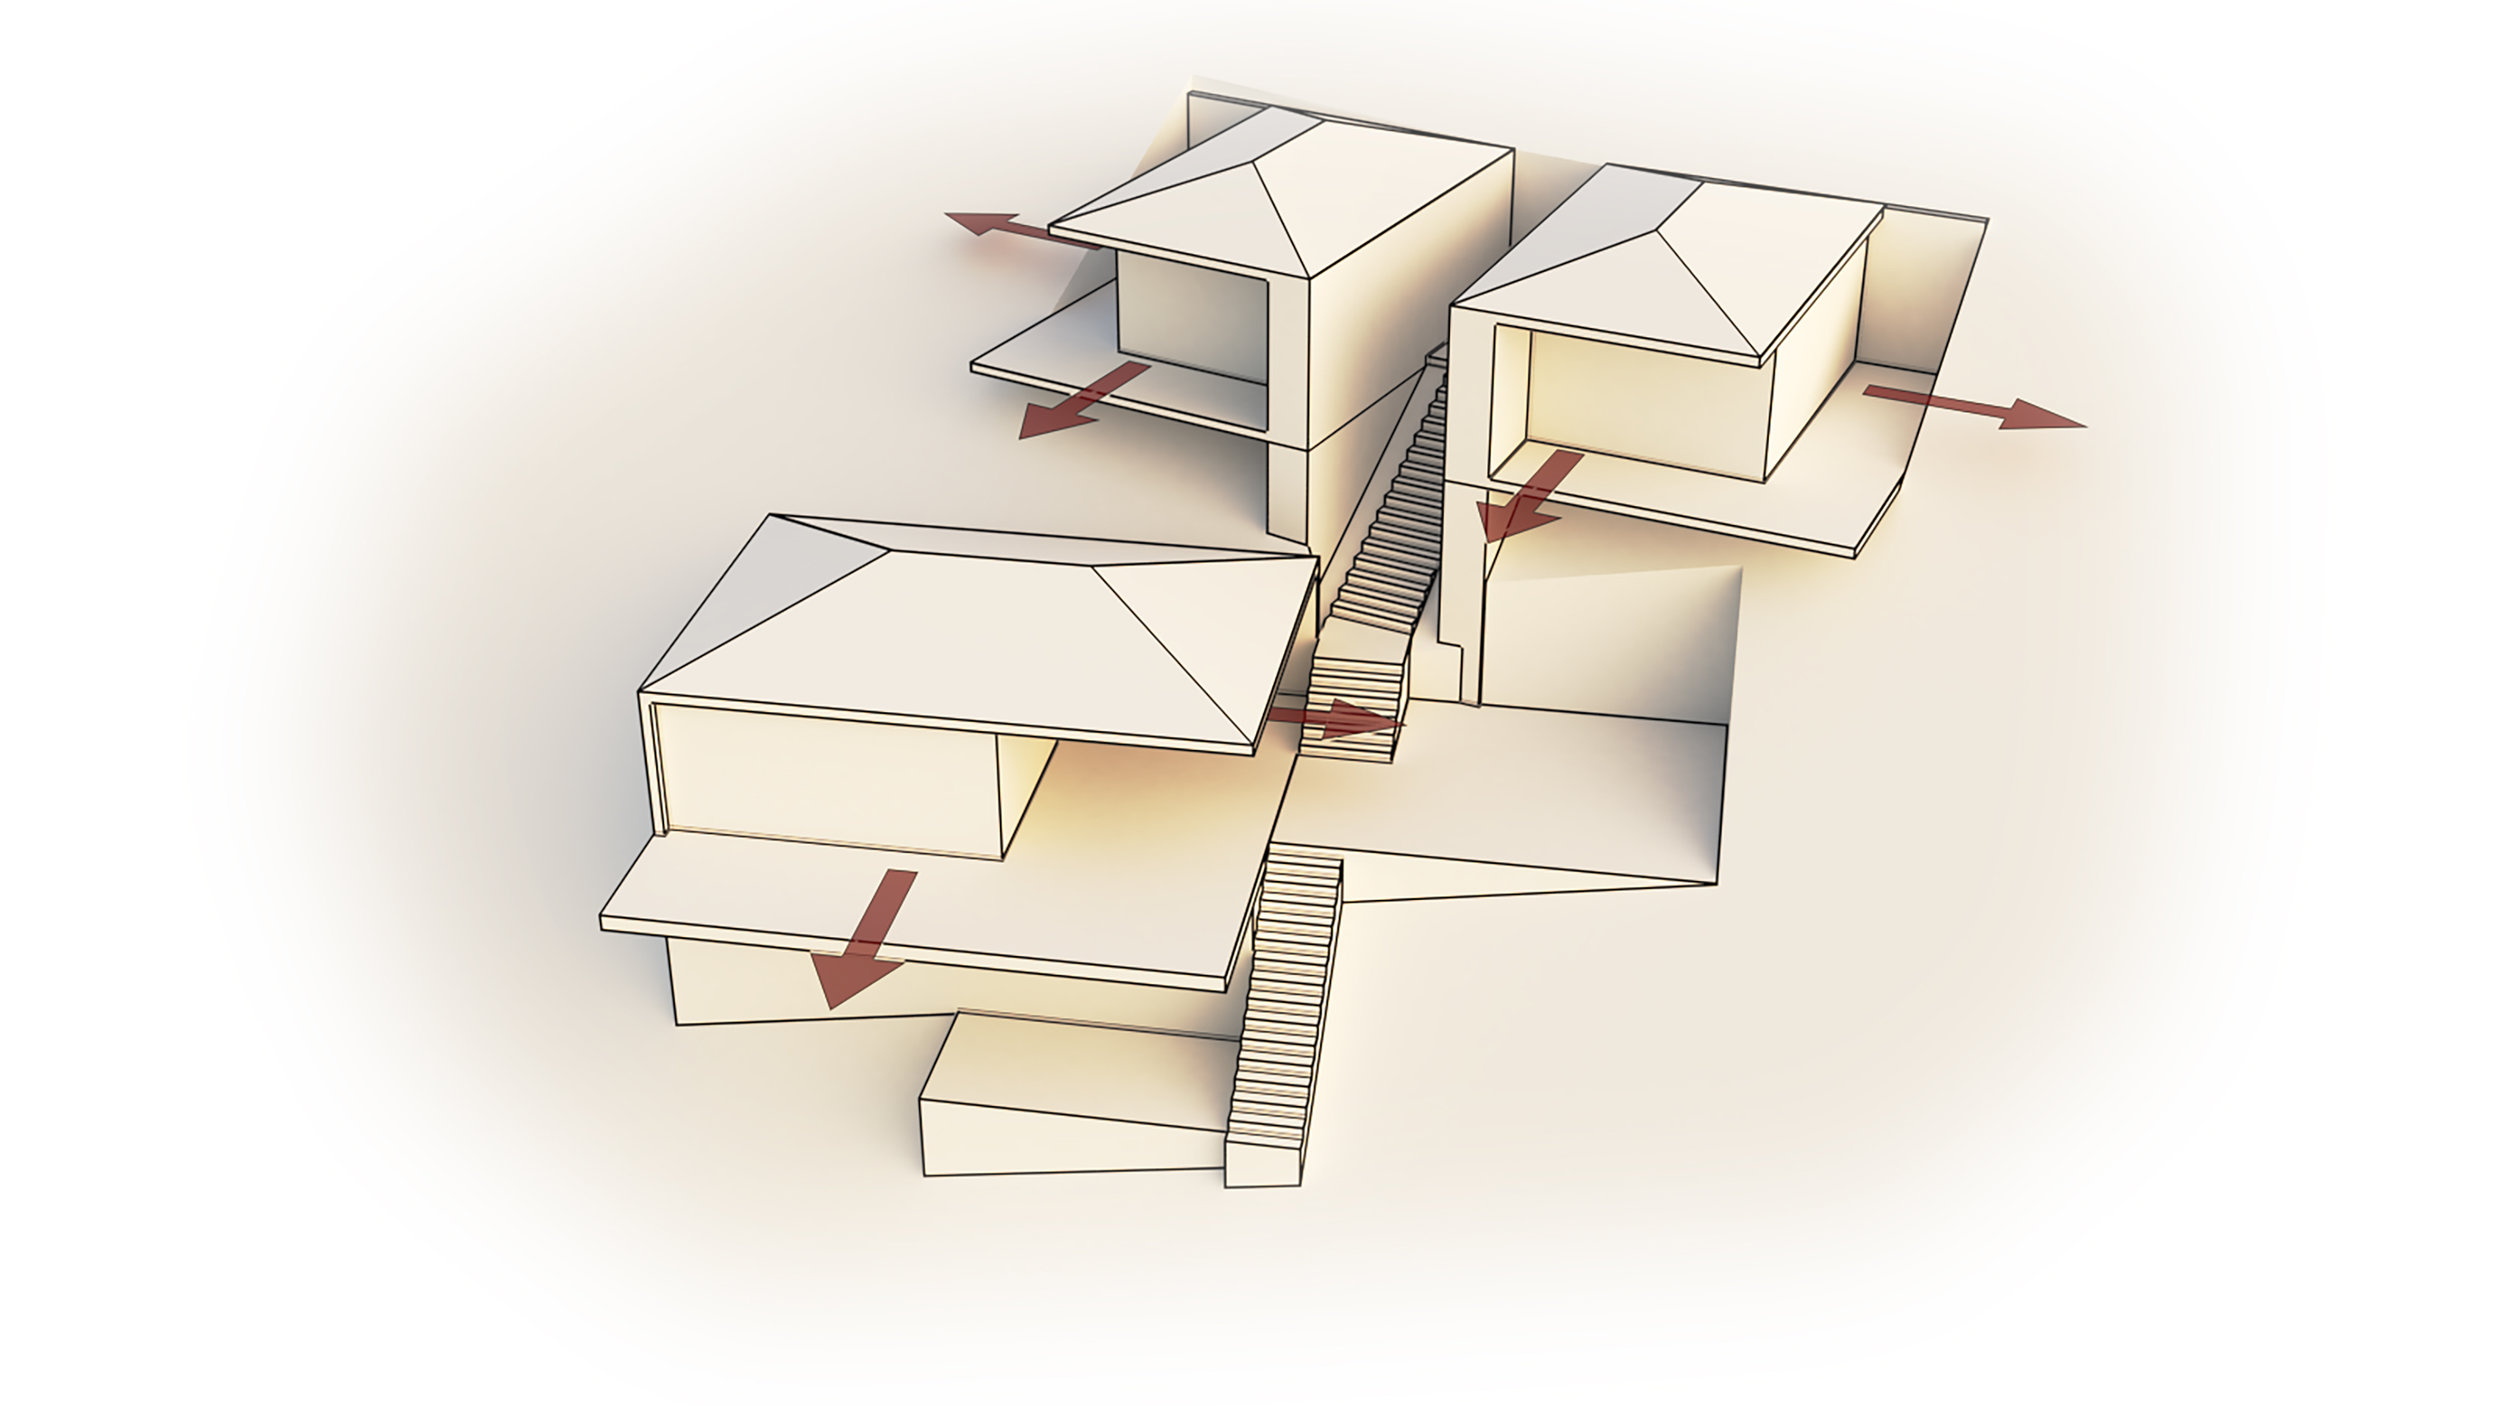 MTAD_TRUNK BAY RESIDENCE DIAGRAM 04.jpg